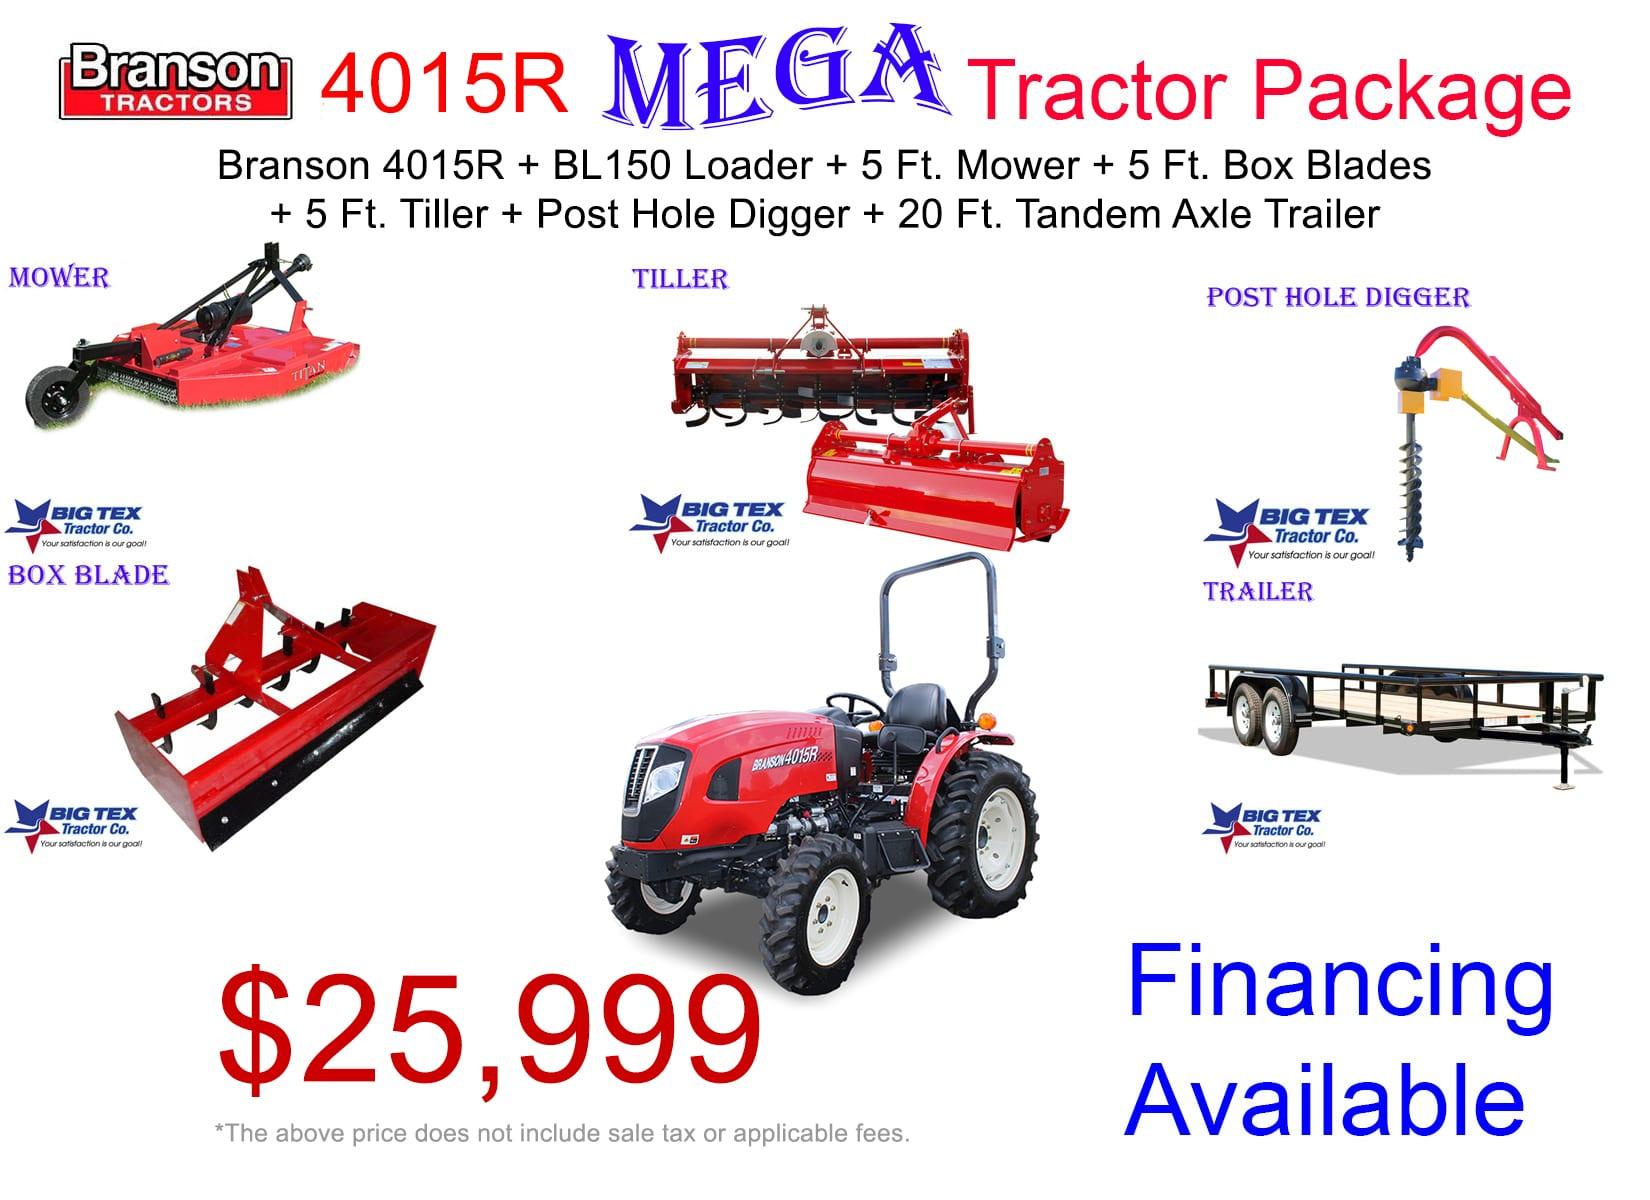 2019 - 4015R Mega T.Package